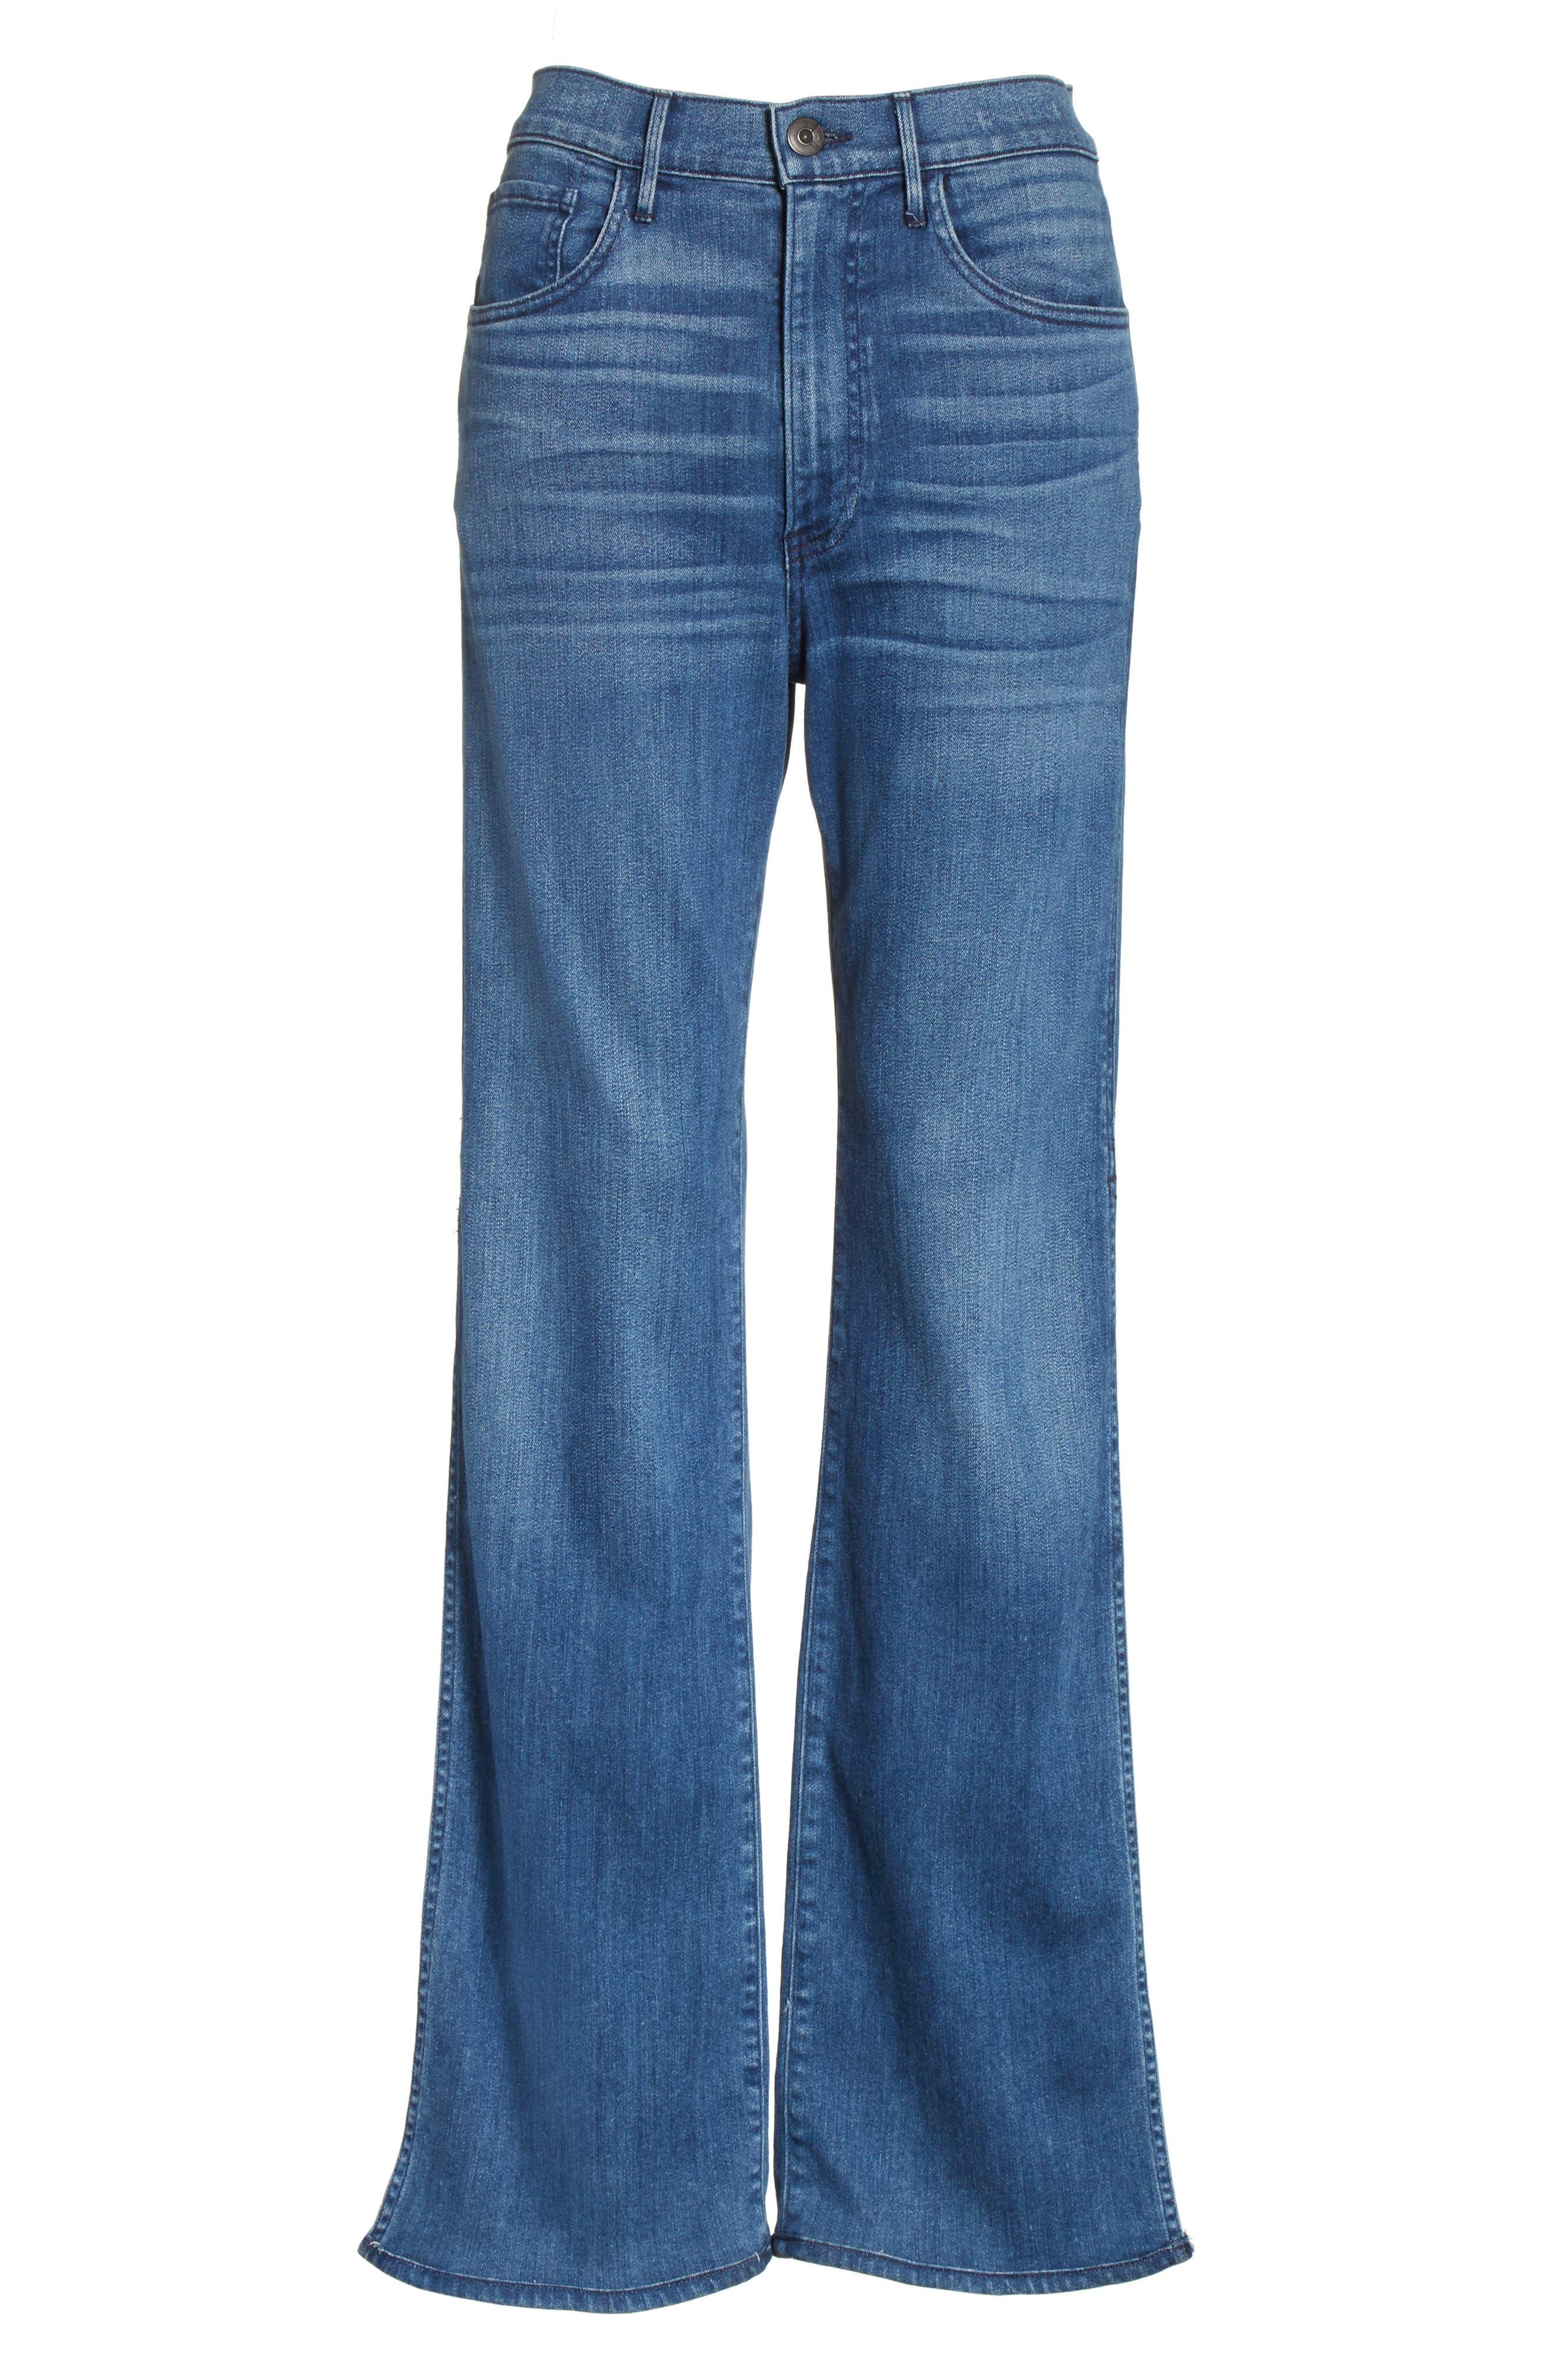 W4 Adeline High Waist Split Flare Jeans,                             Alternate thumbnail 6, color,                             Leia